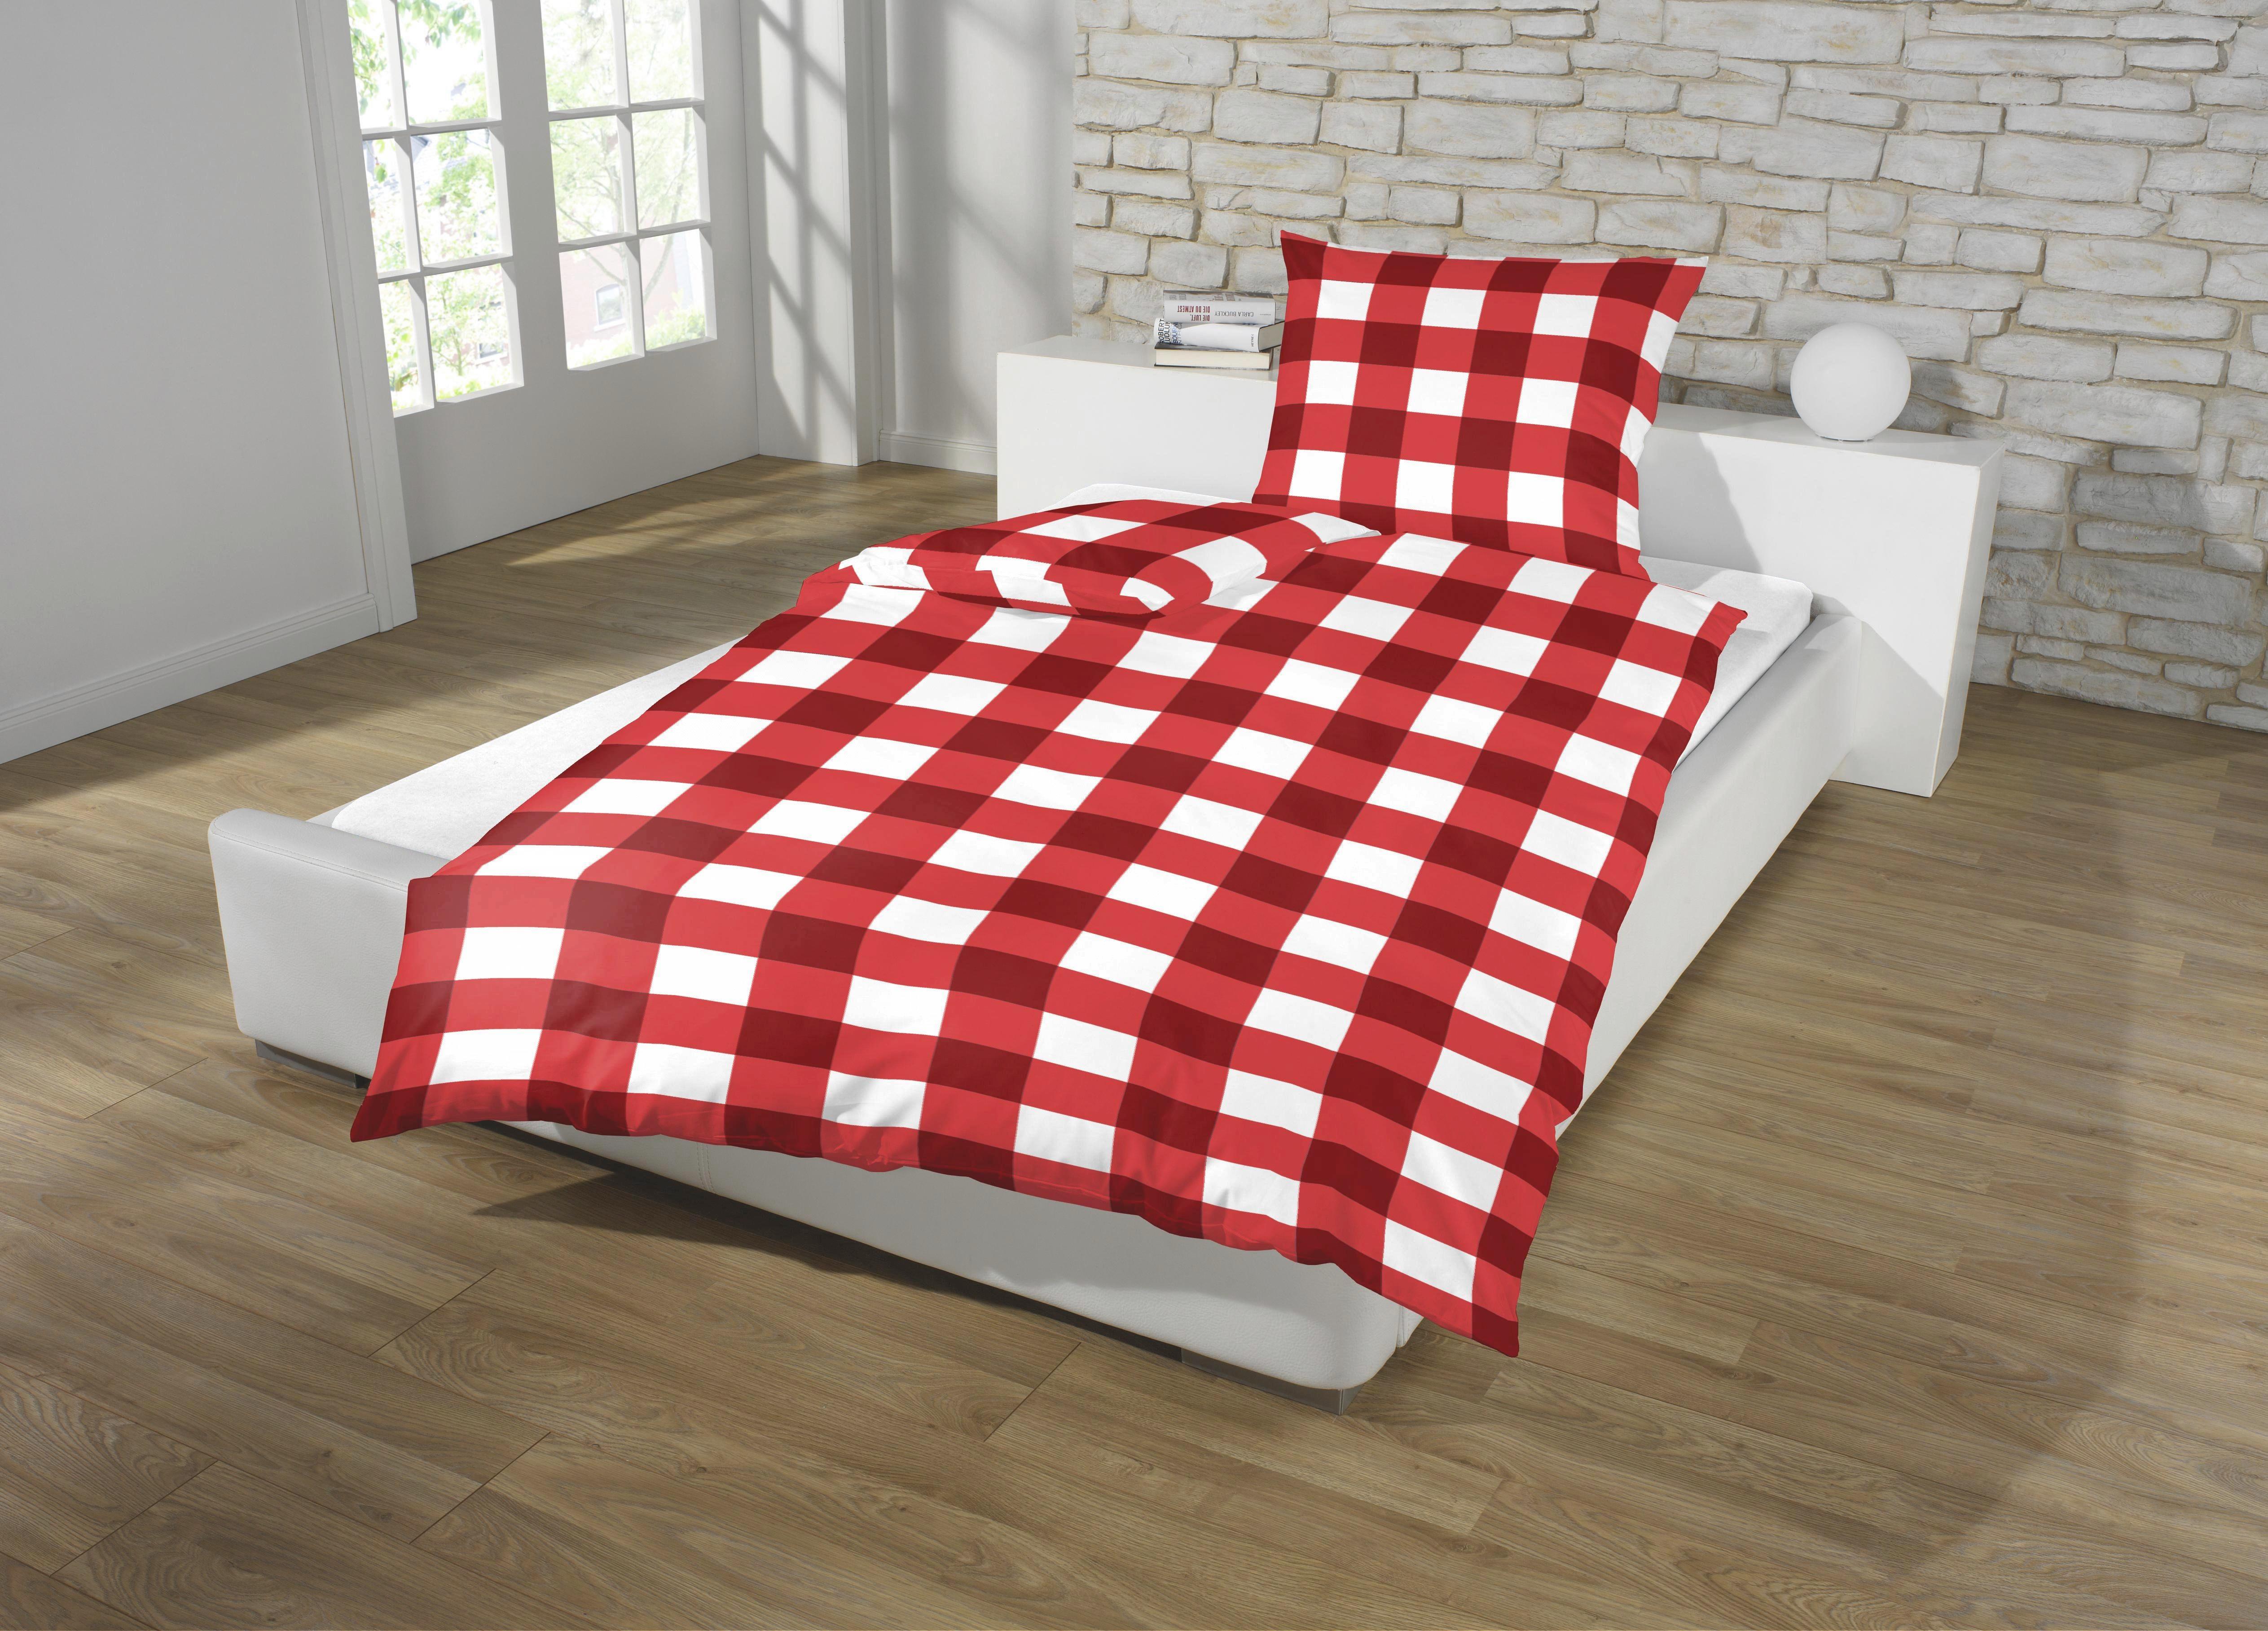 wann sollte man bettdecken wechseln deko idee f r. Black Bedroom Furniture Sets. Home Design Ideas